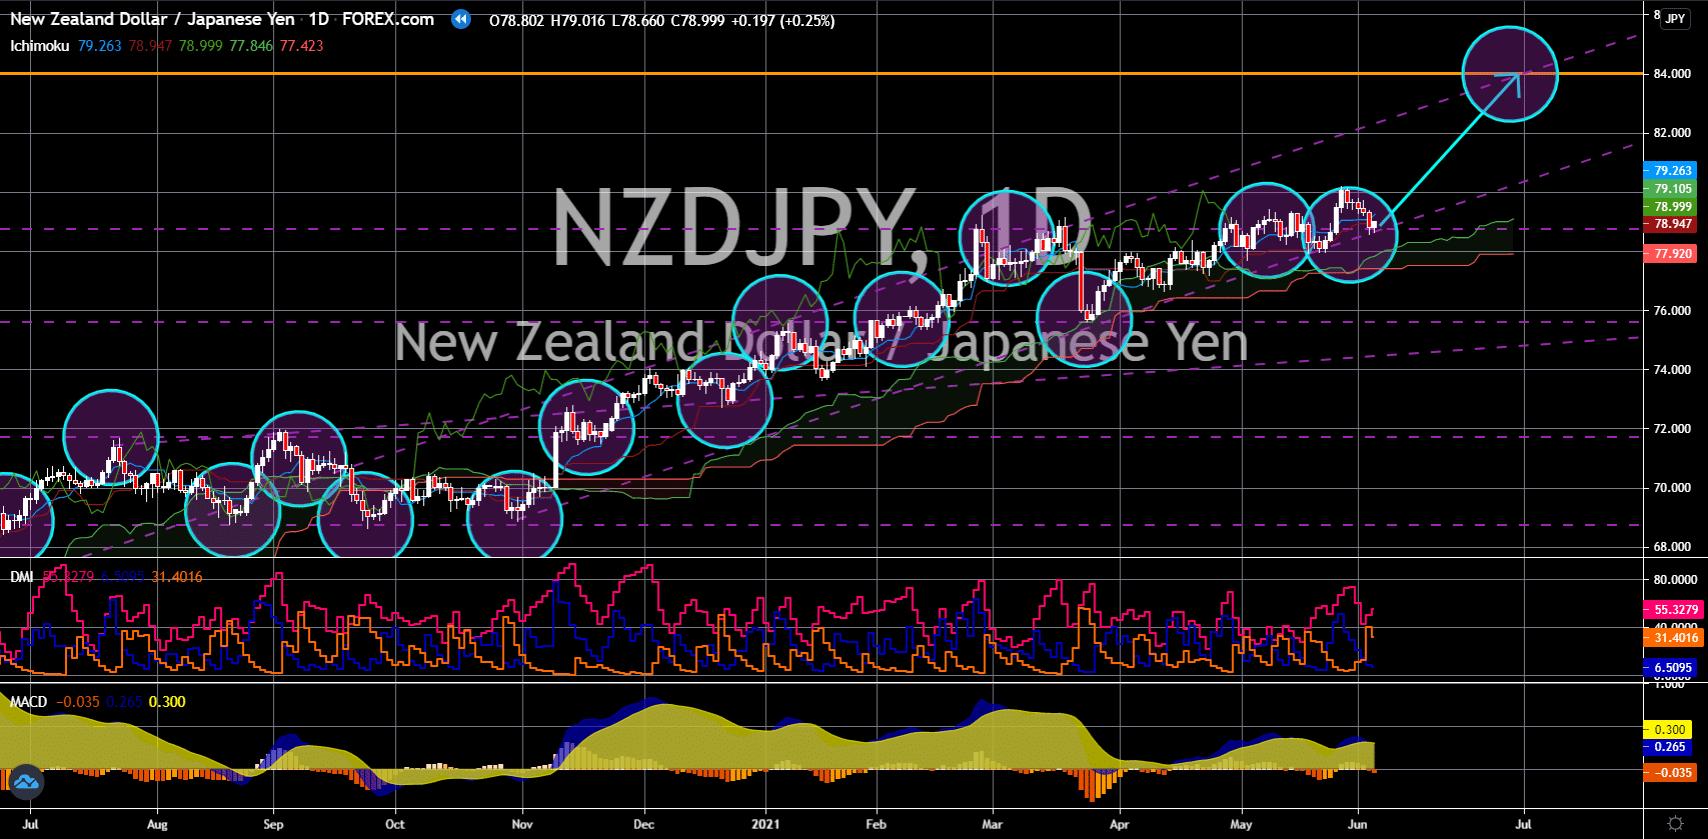 FinanceBrokerage - Market News: NZD/JPY Chart